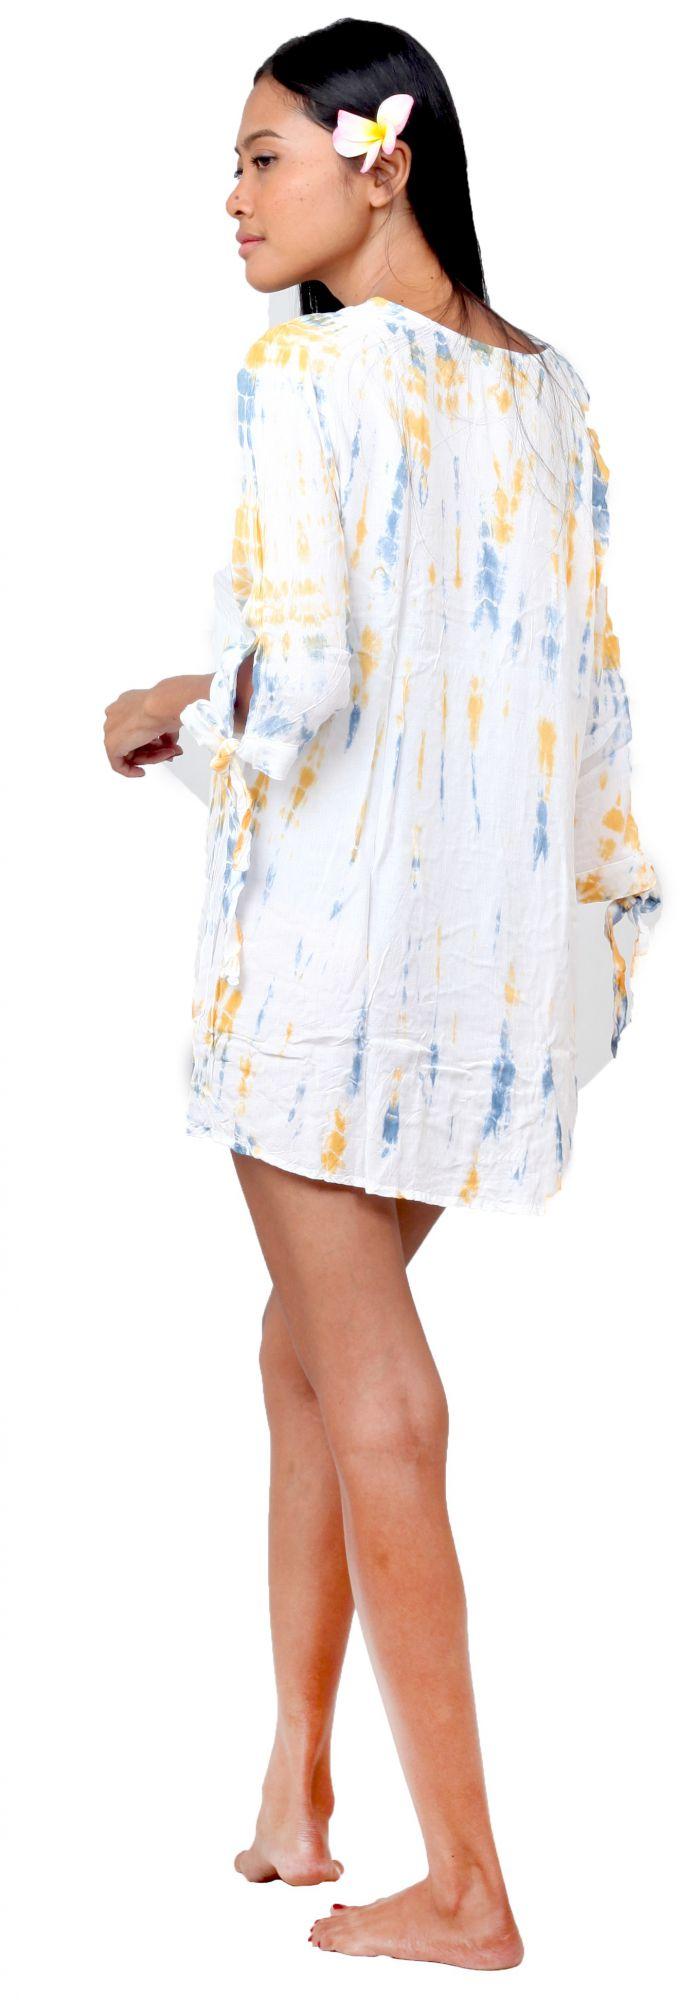 Robe de plage courte tie dye blanche